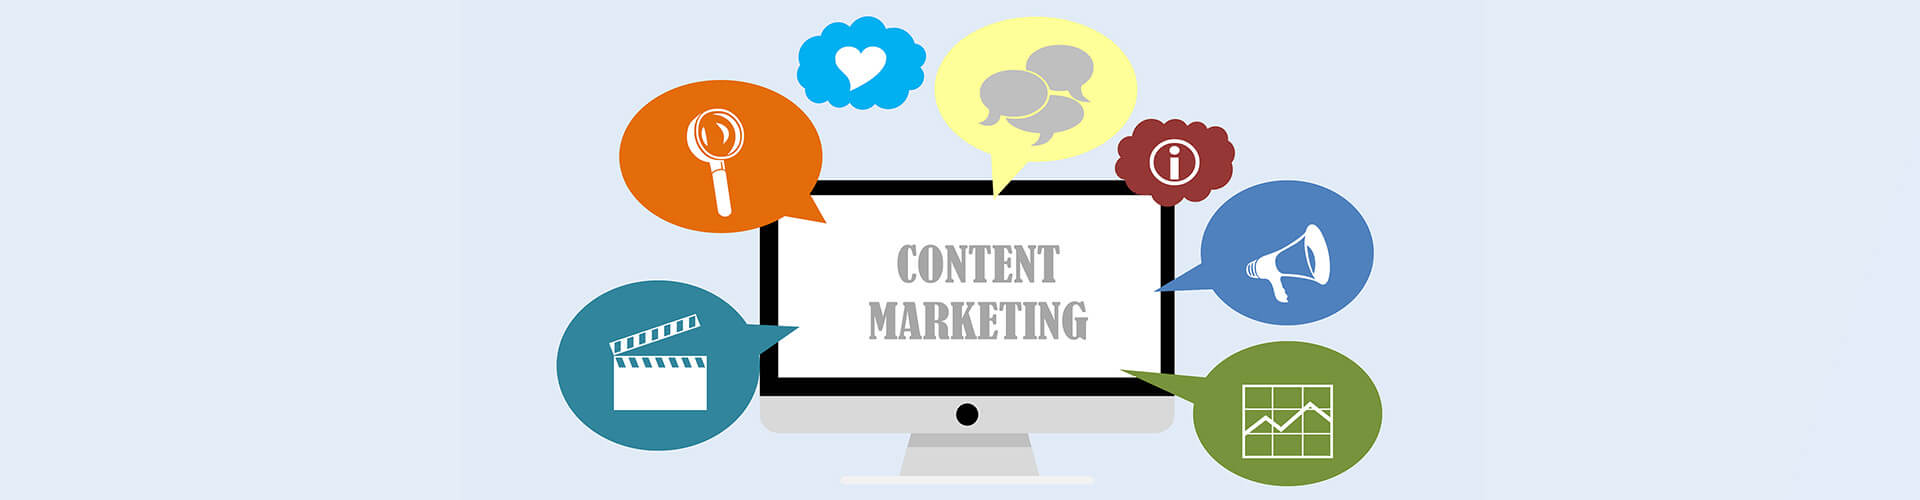 content marketing aurangabad